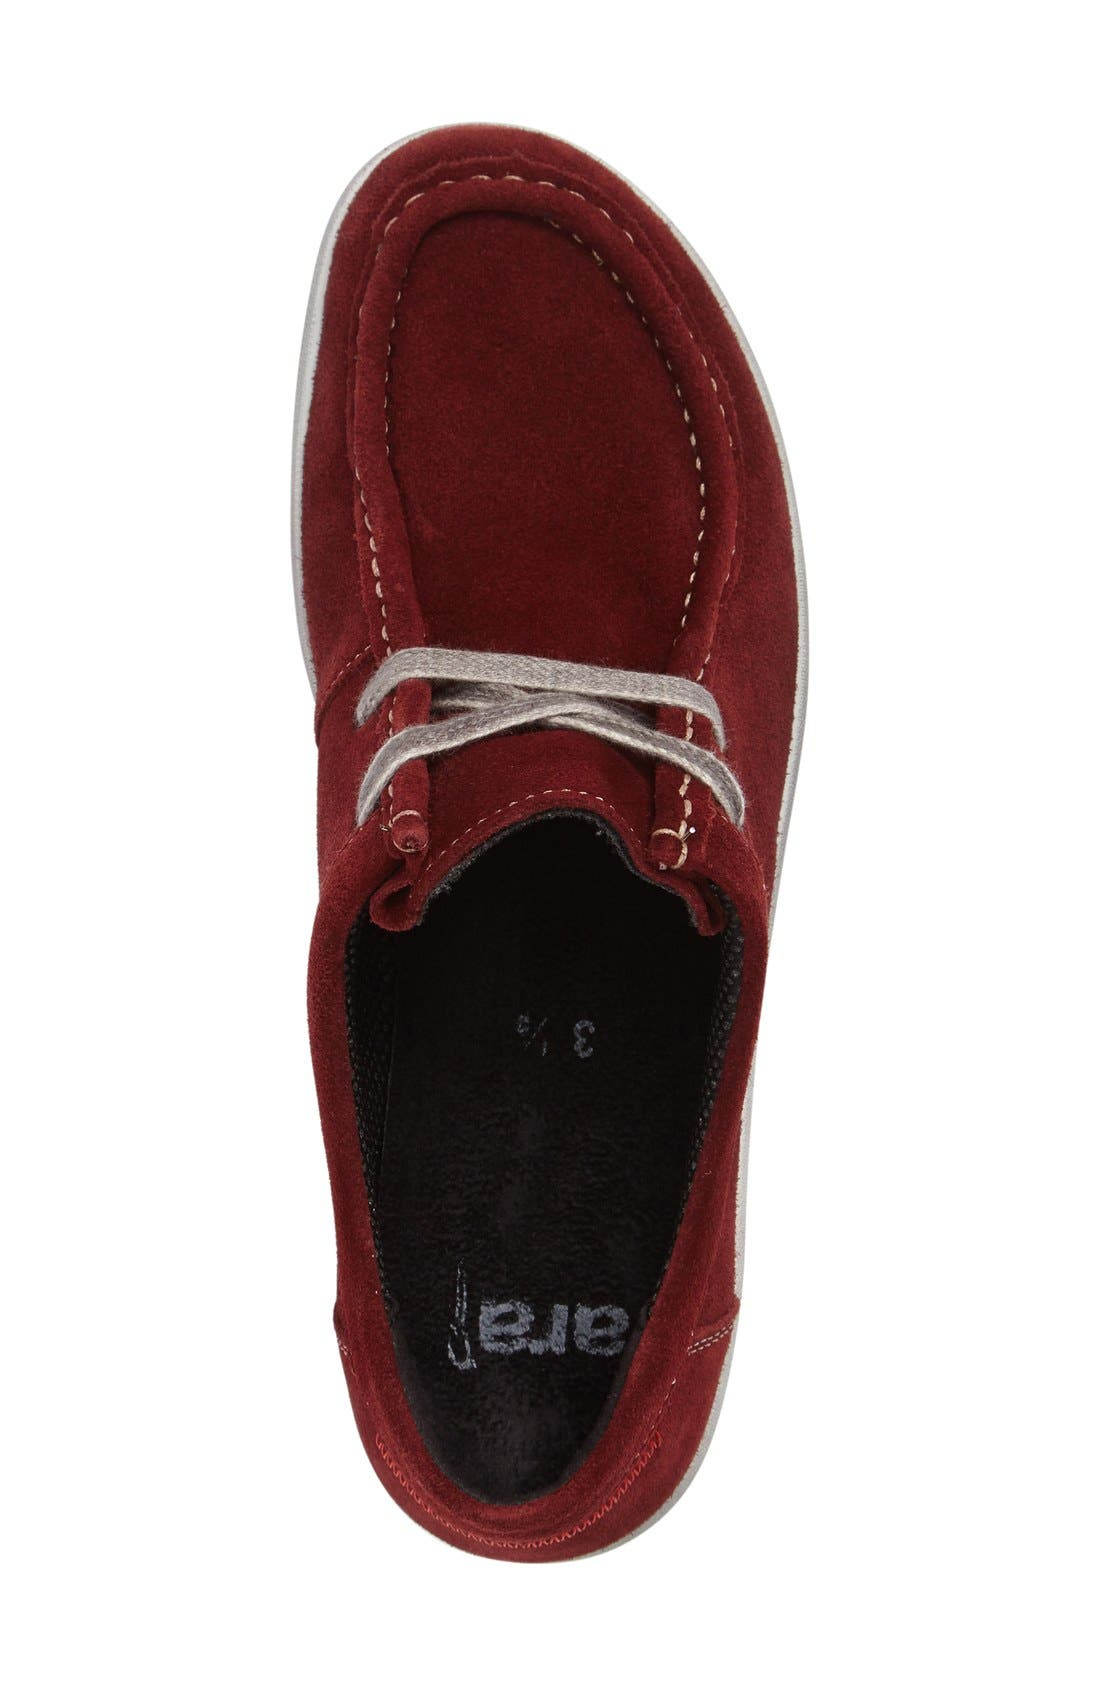 Trista Sneaker,                             Alternate thumbnail 3, color,                             Burgundy Suede